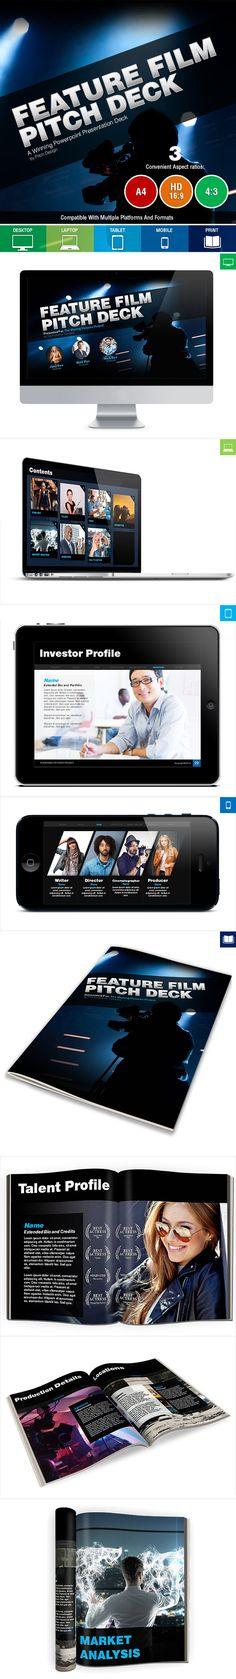 Feature Film Pitch Deck #powerpoint #design Download: http://graphicriver.net/item/feature-film-pitch-deck/10803618?ref=ksioks